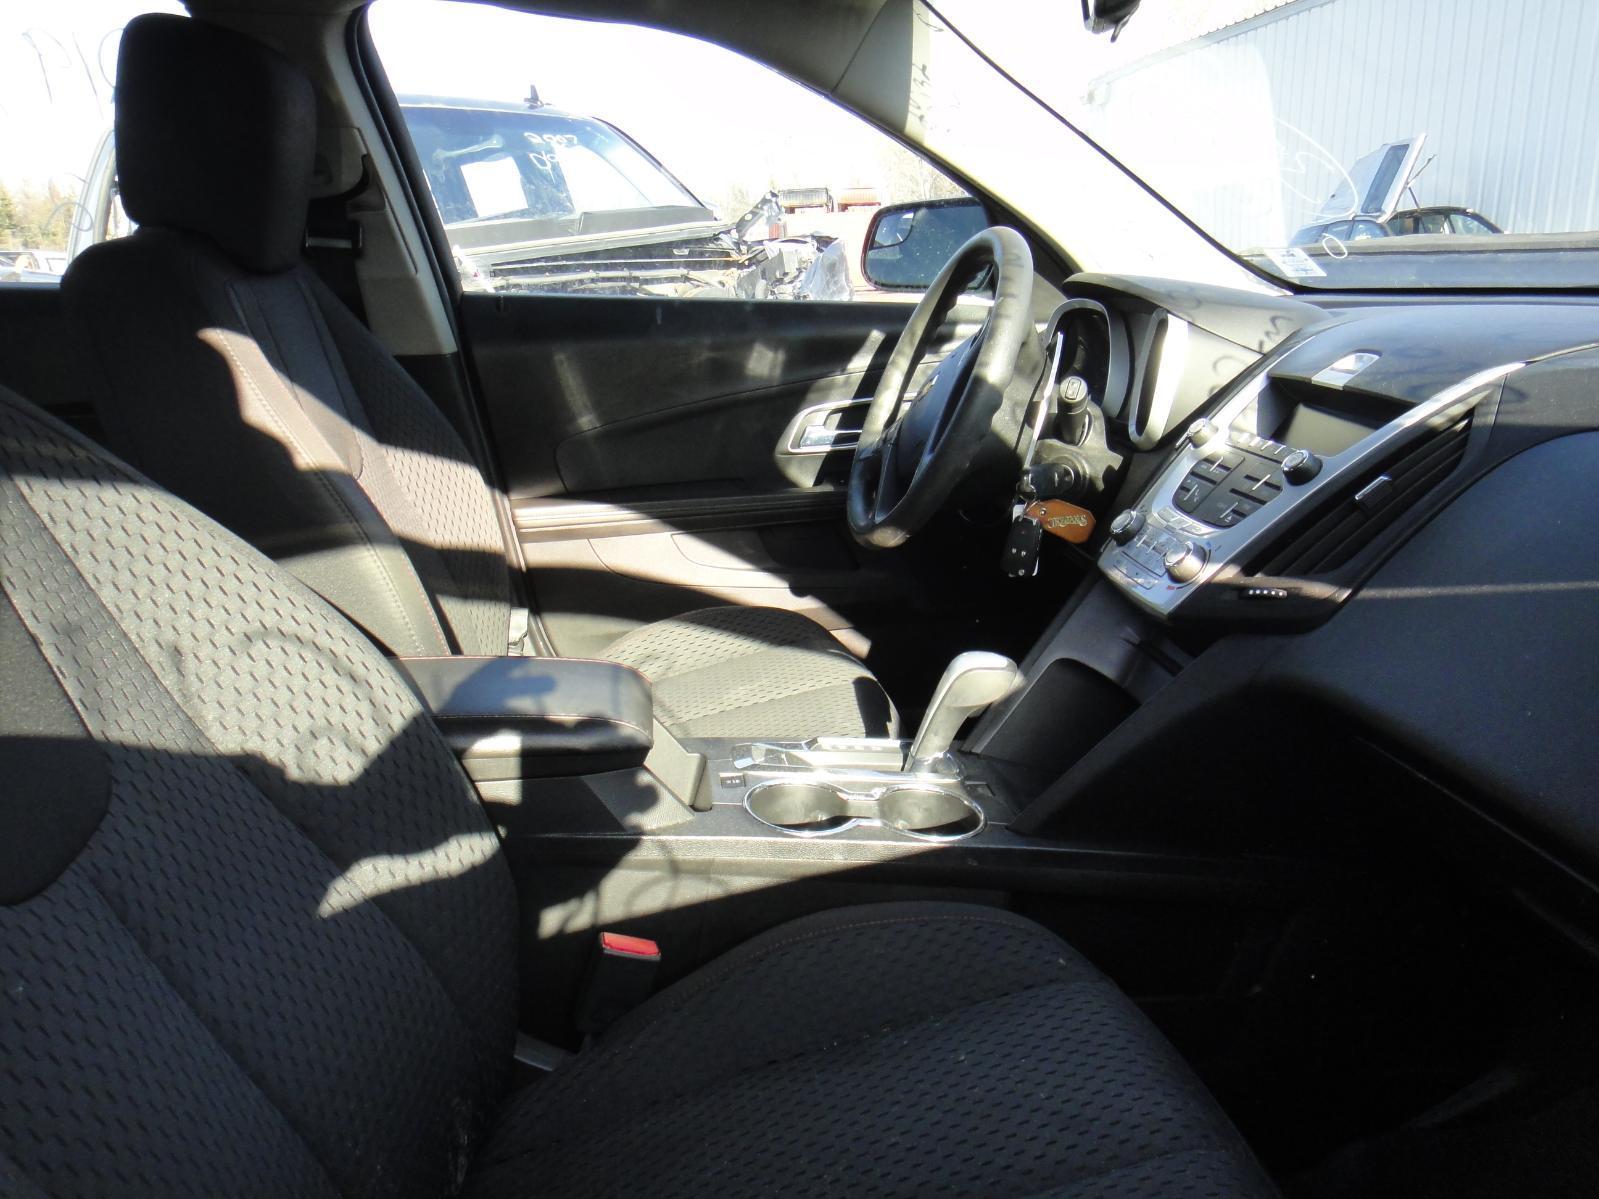 2012 Chevrolet Equinox LS AWD full